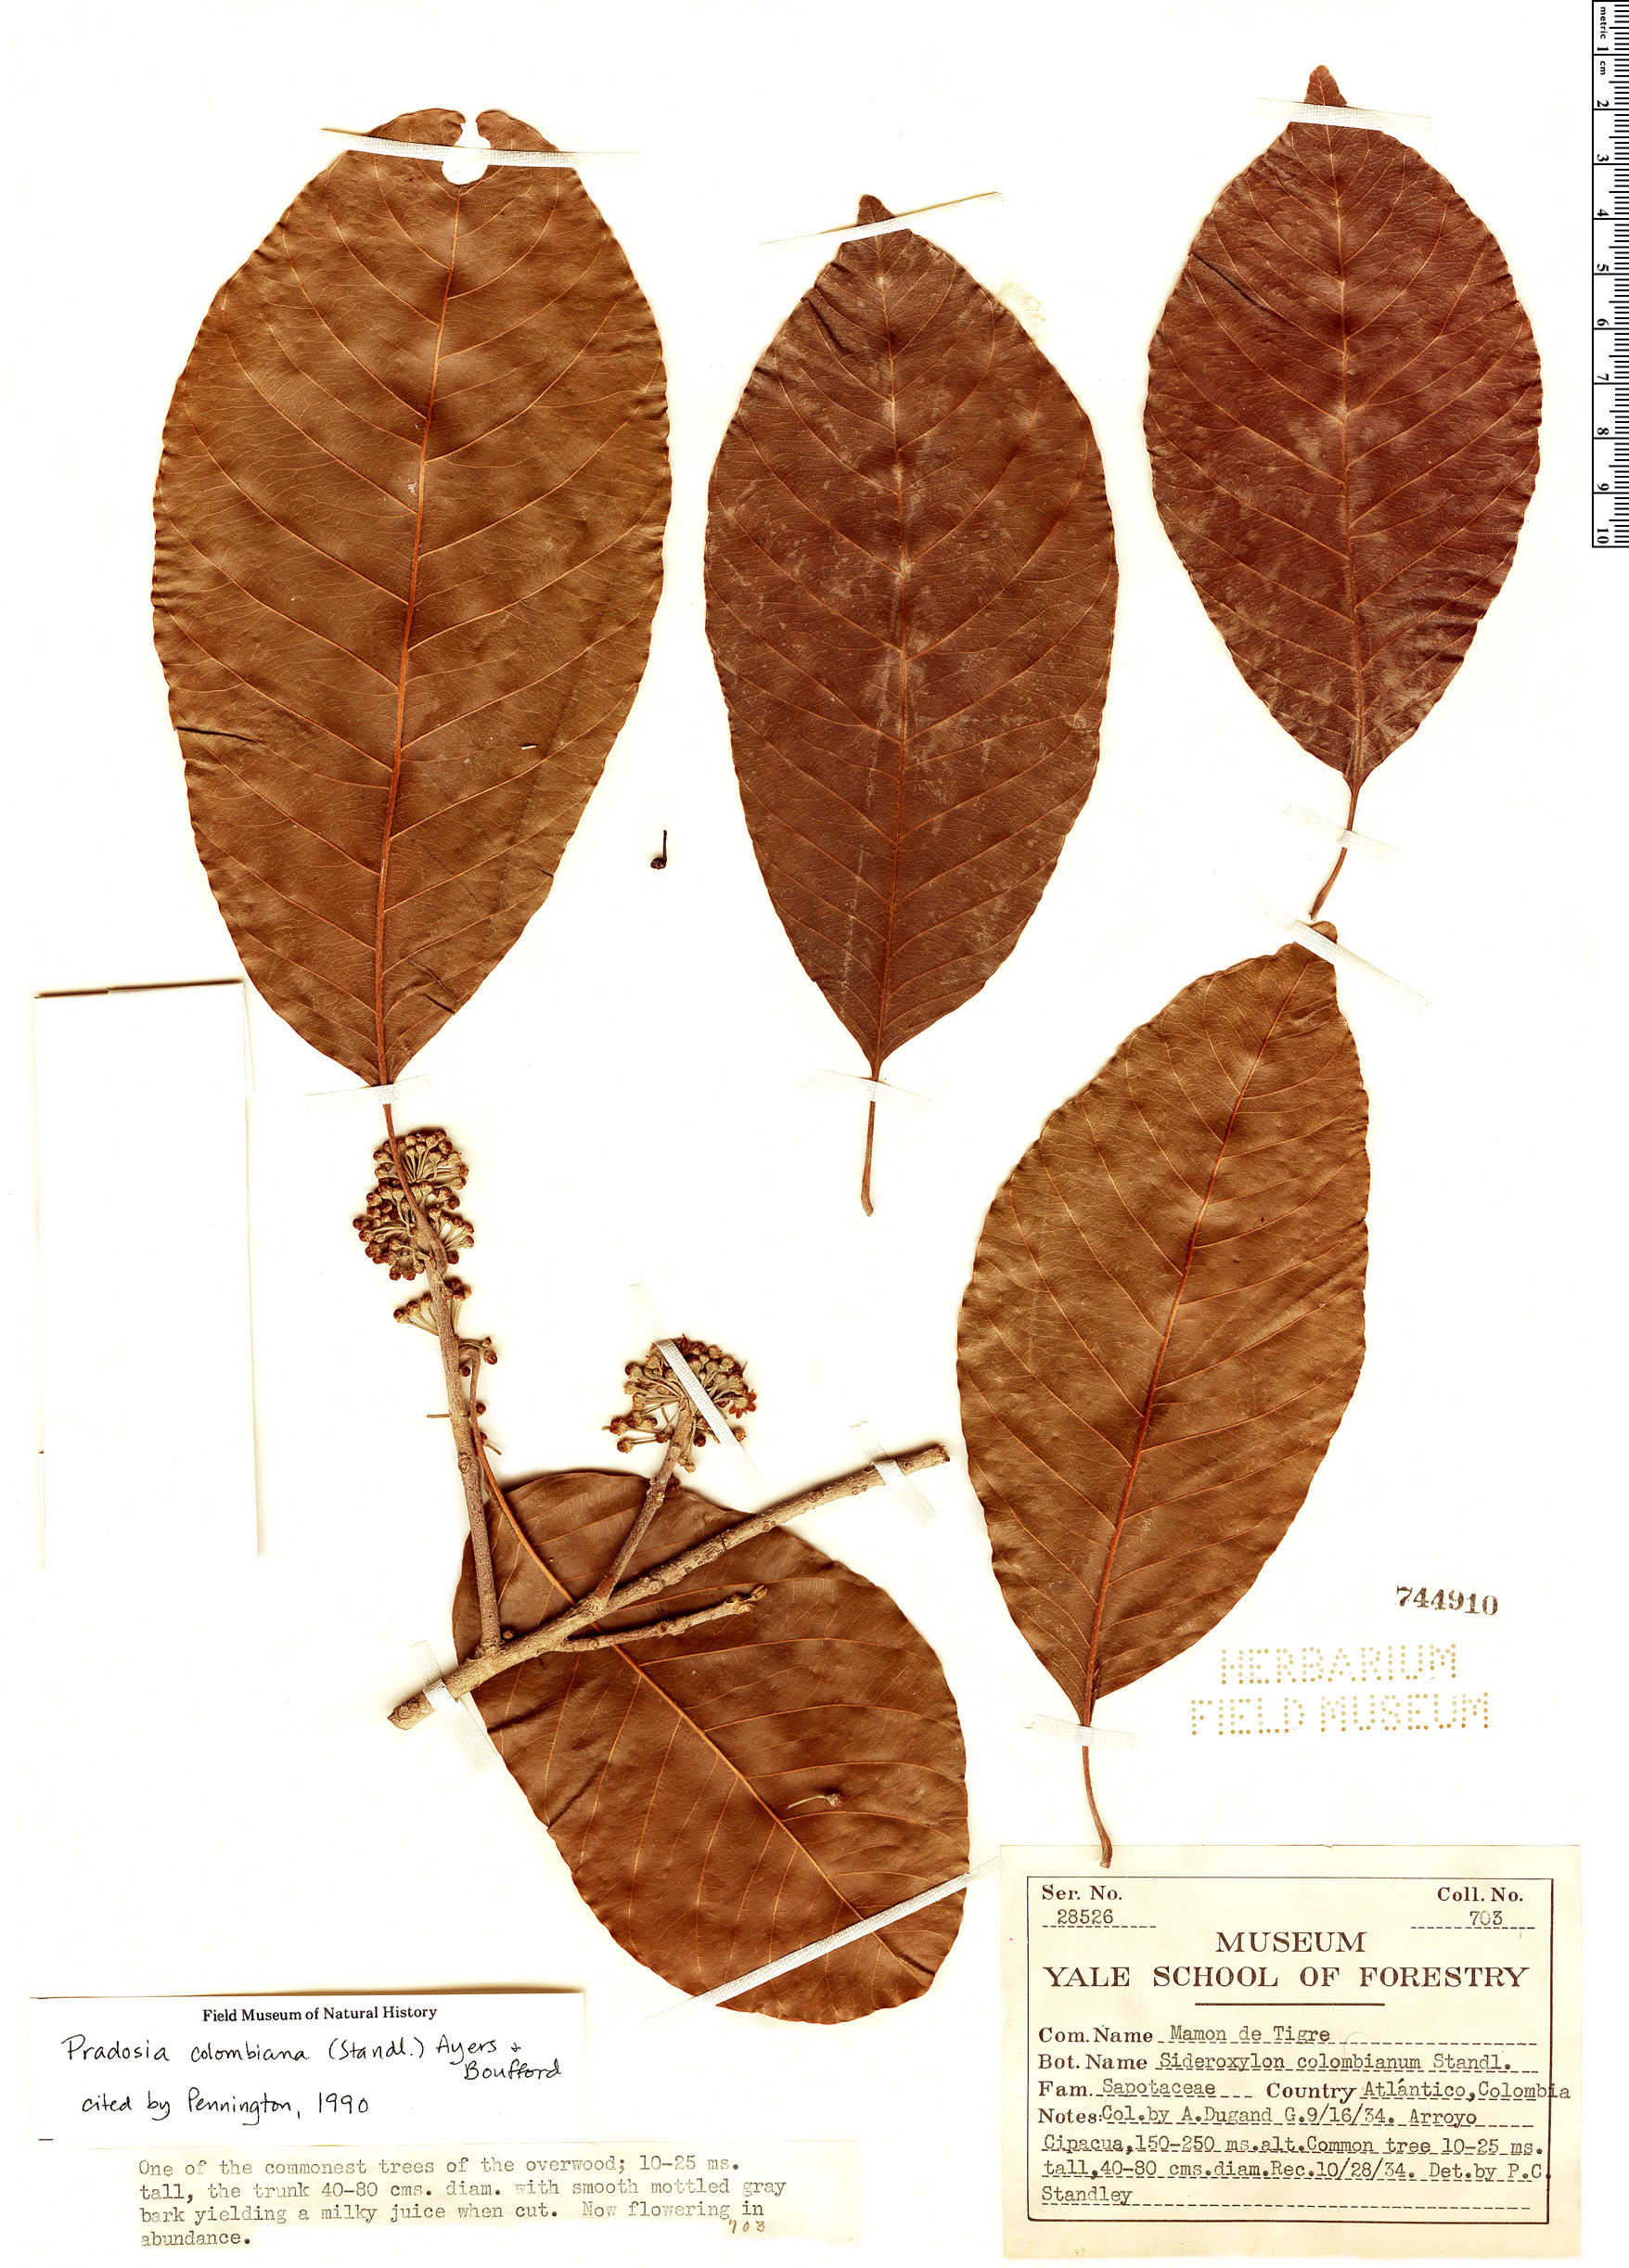 Specimen: Pradosia colombiana